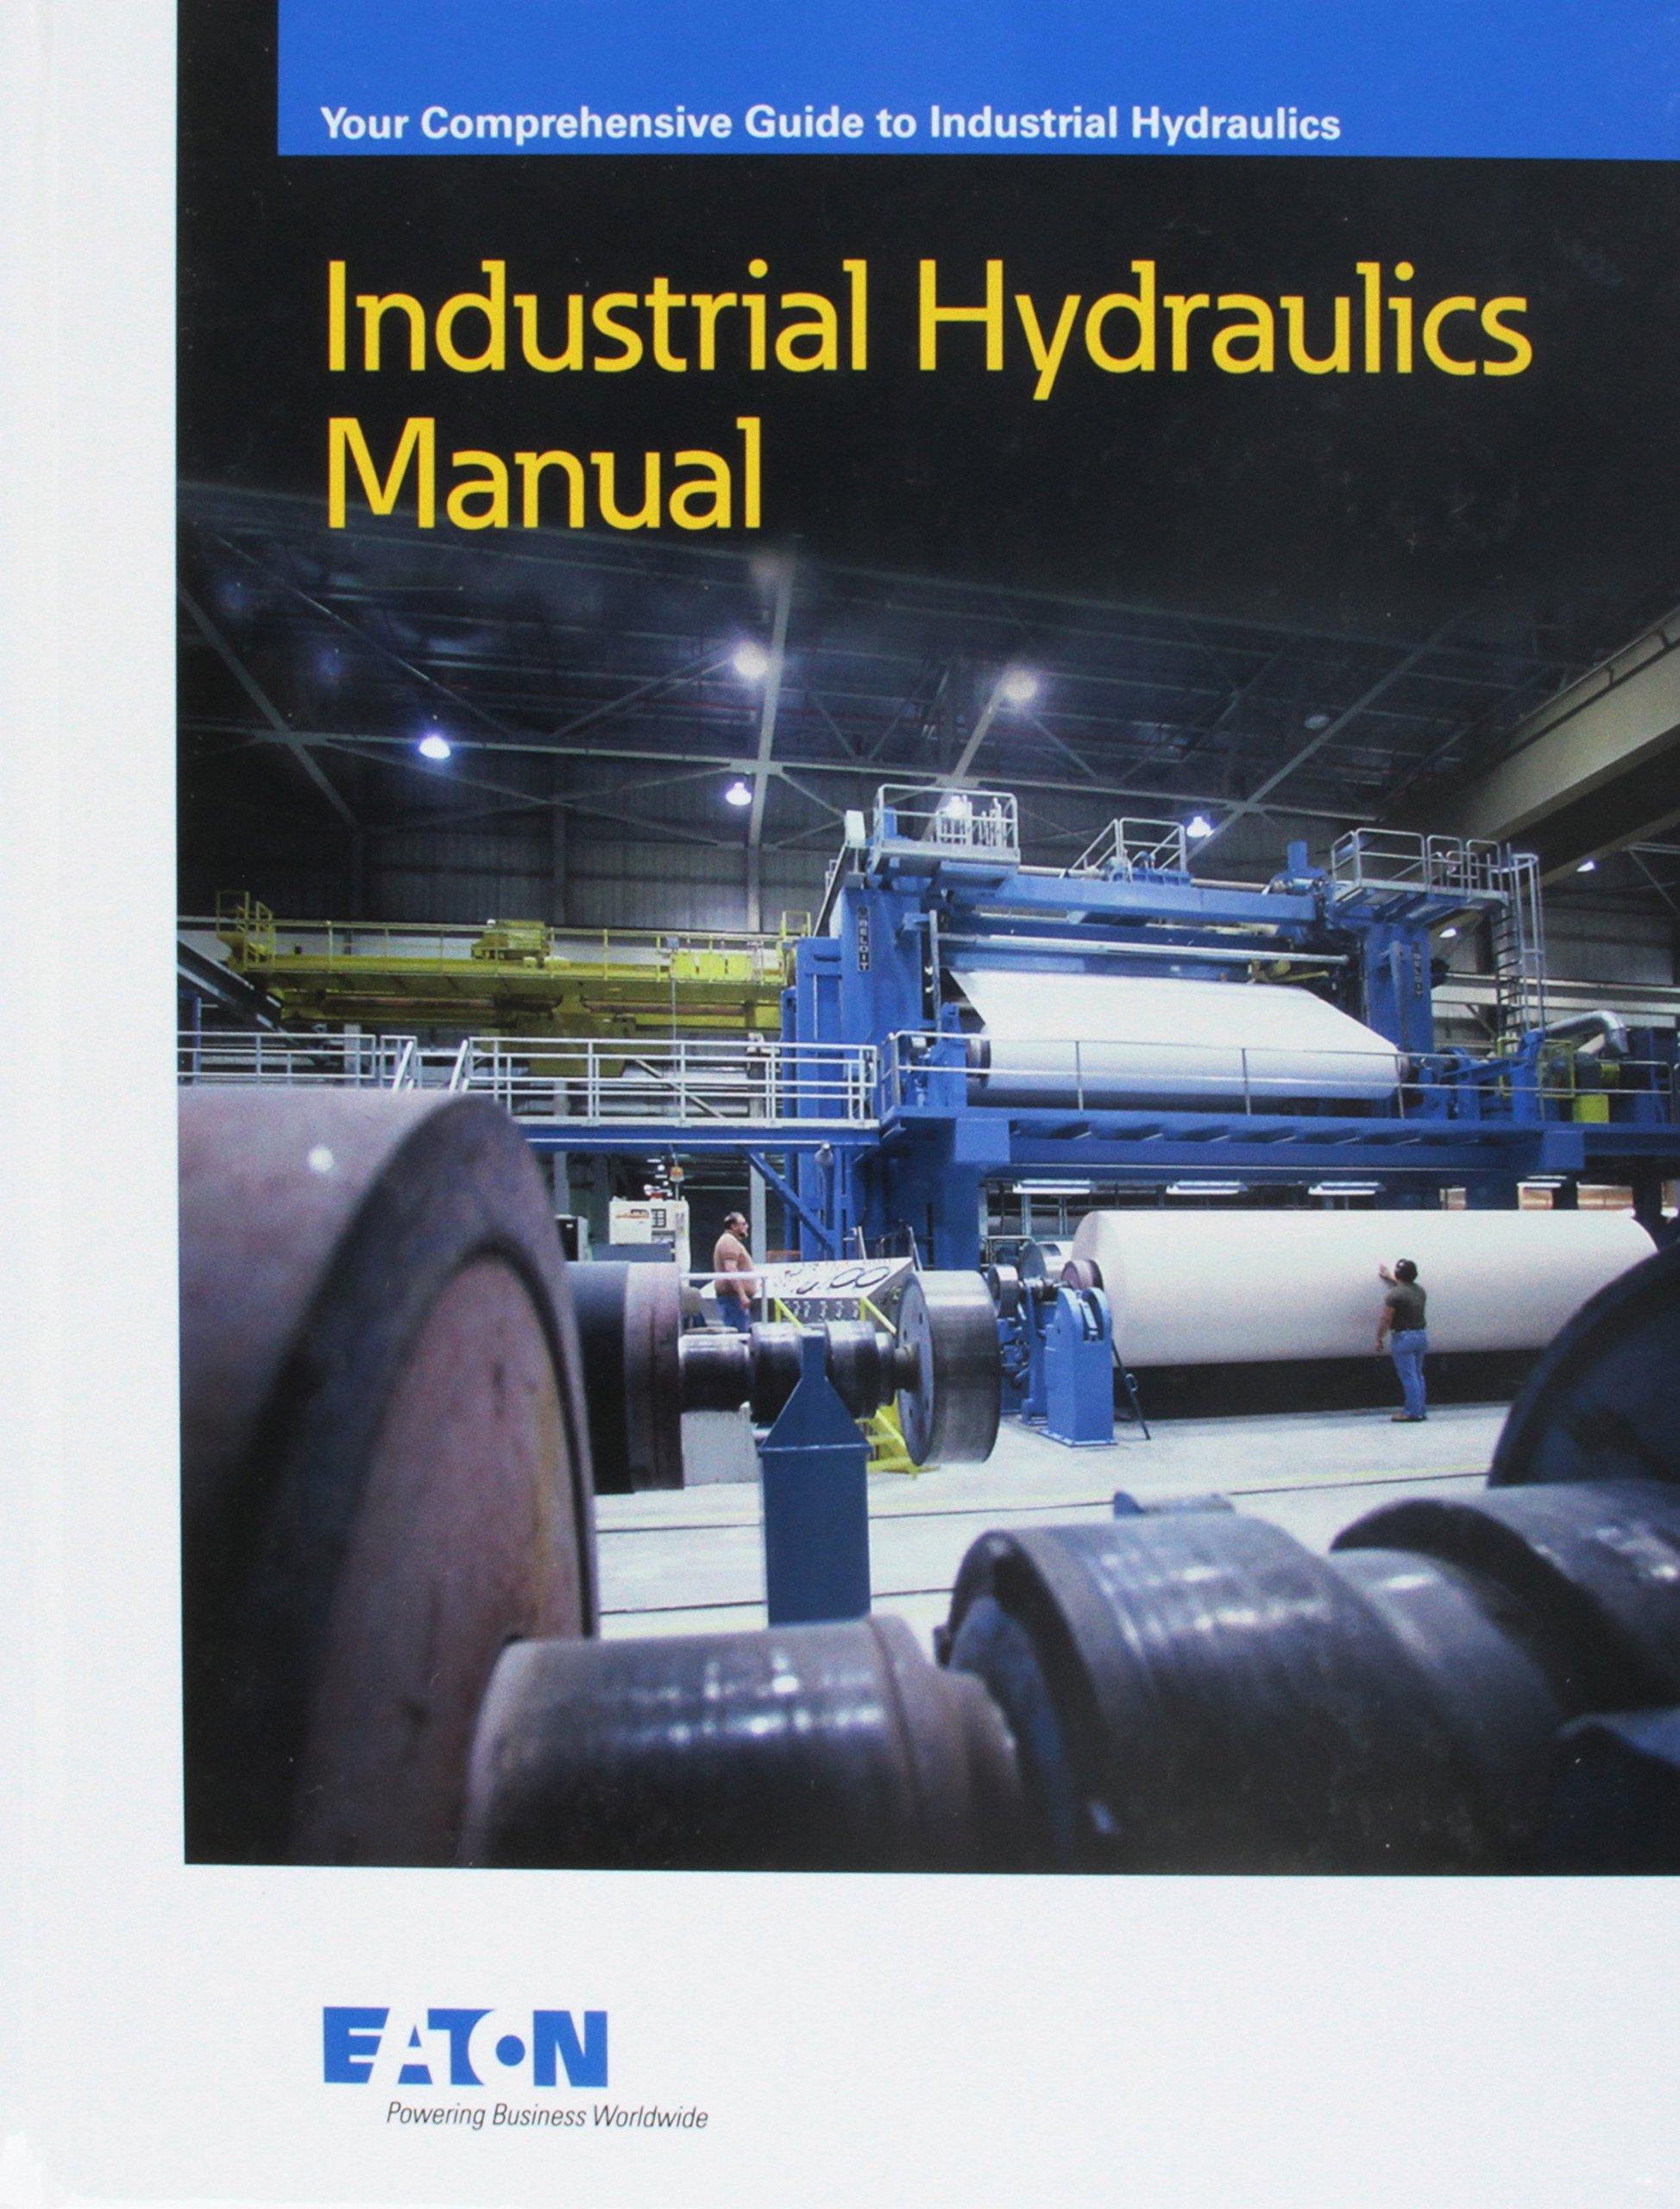 Industrial Hydraulics Manual 6th Edition 1st Printing PDF